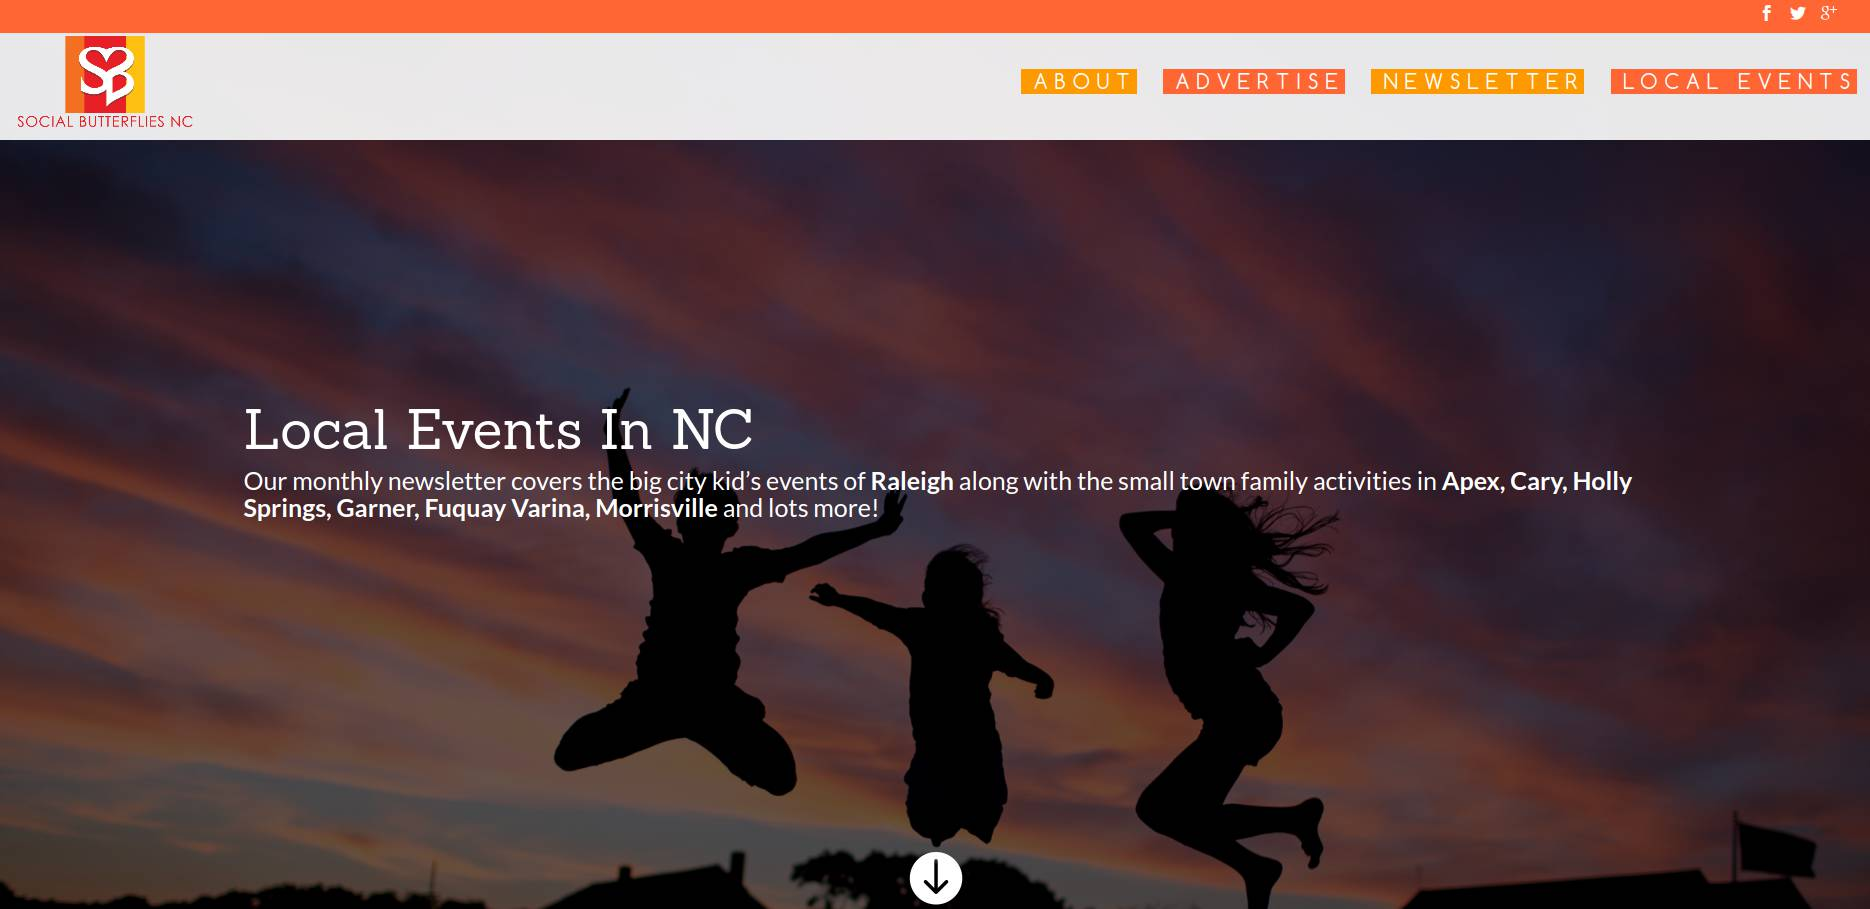 social-butterflies-raleigh-nc-local-events